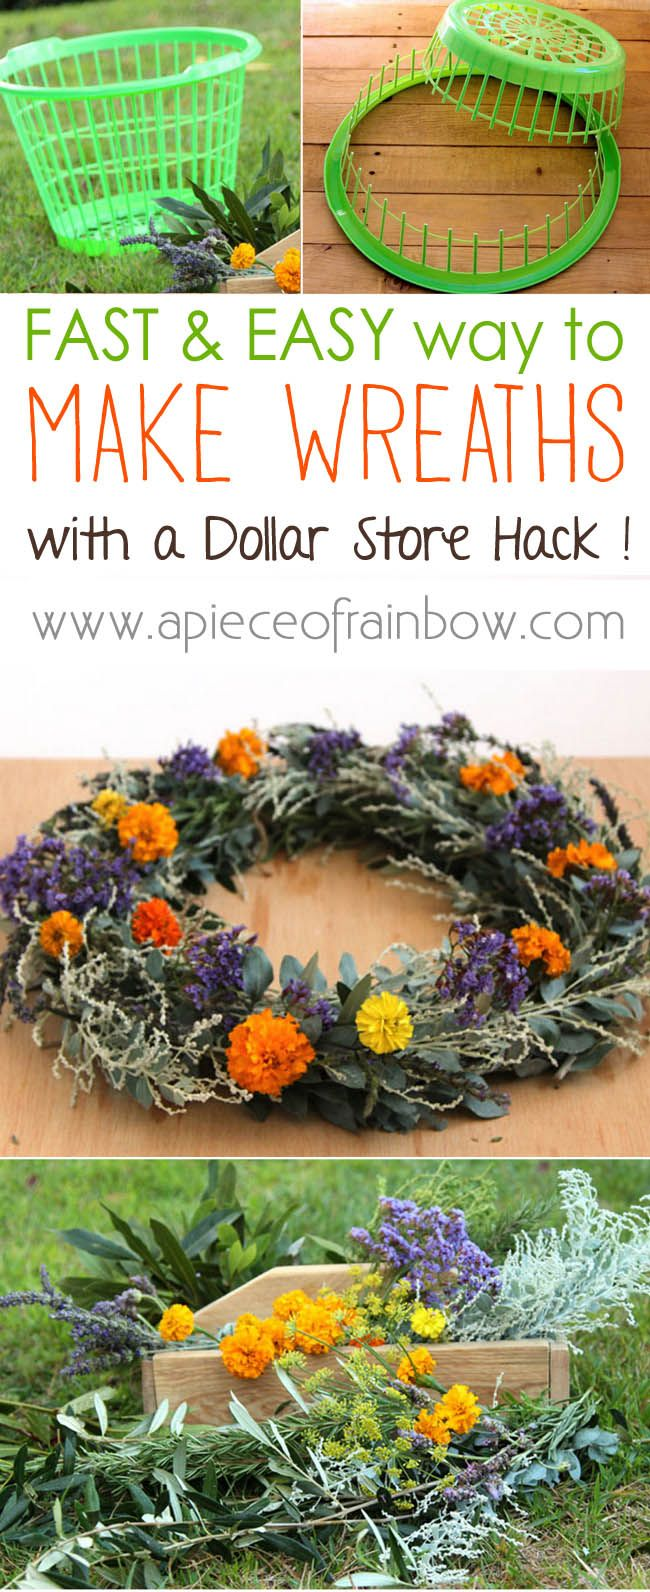 Make Wreath Fast Easy A Dollar Store Hack Wreath Crafts